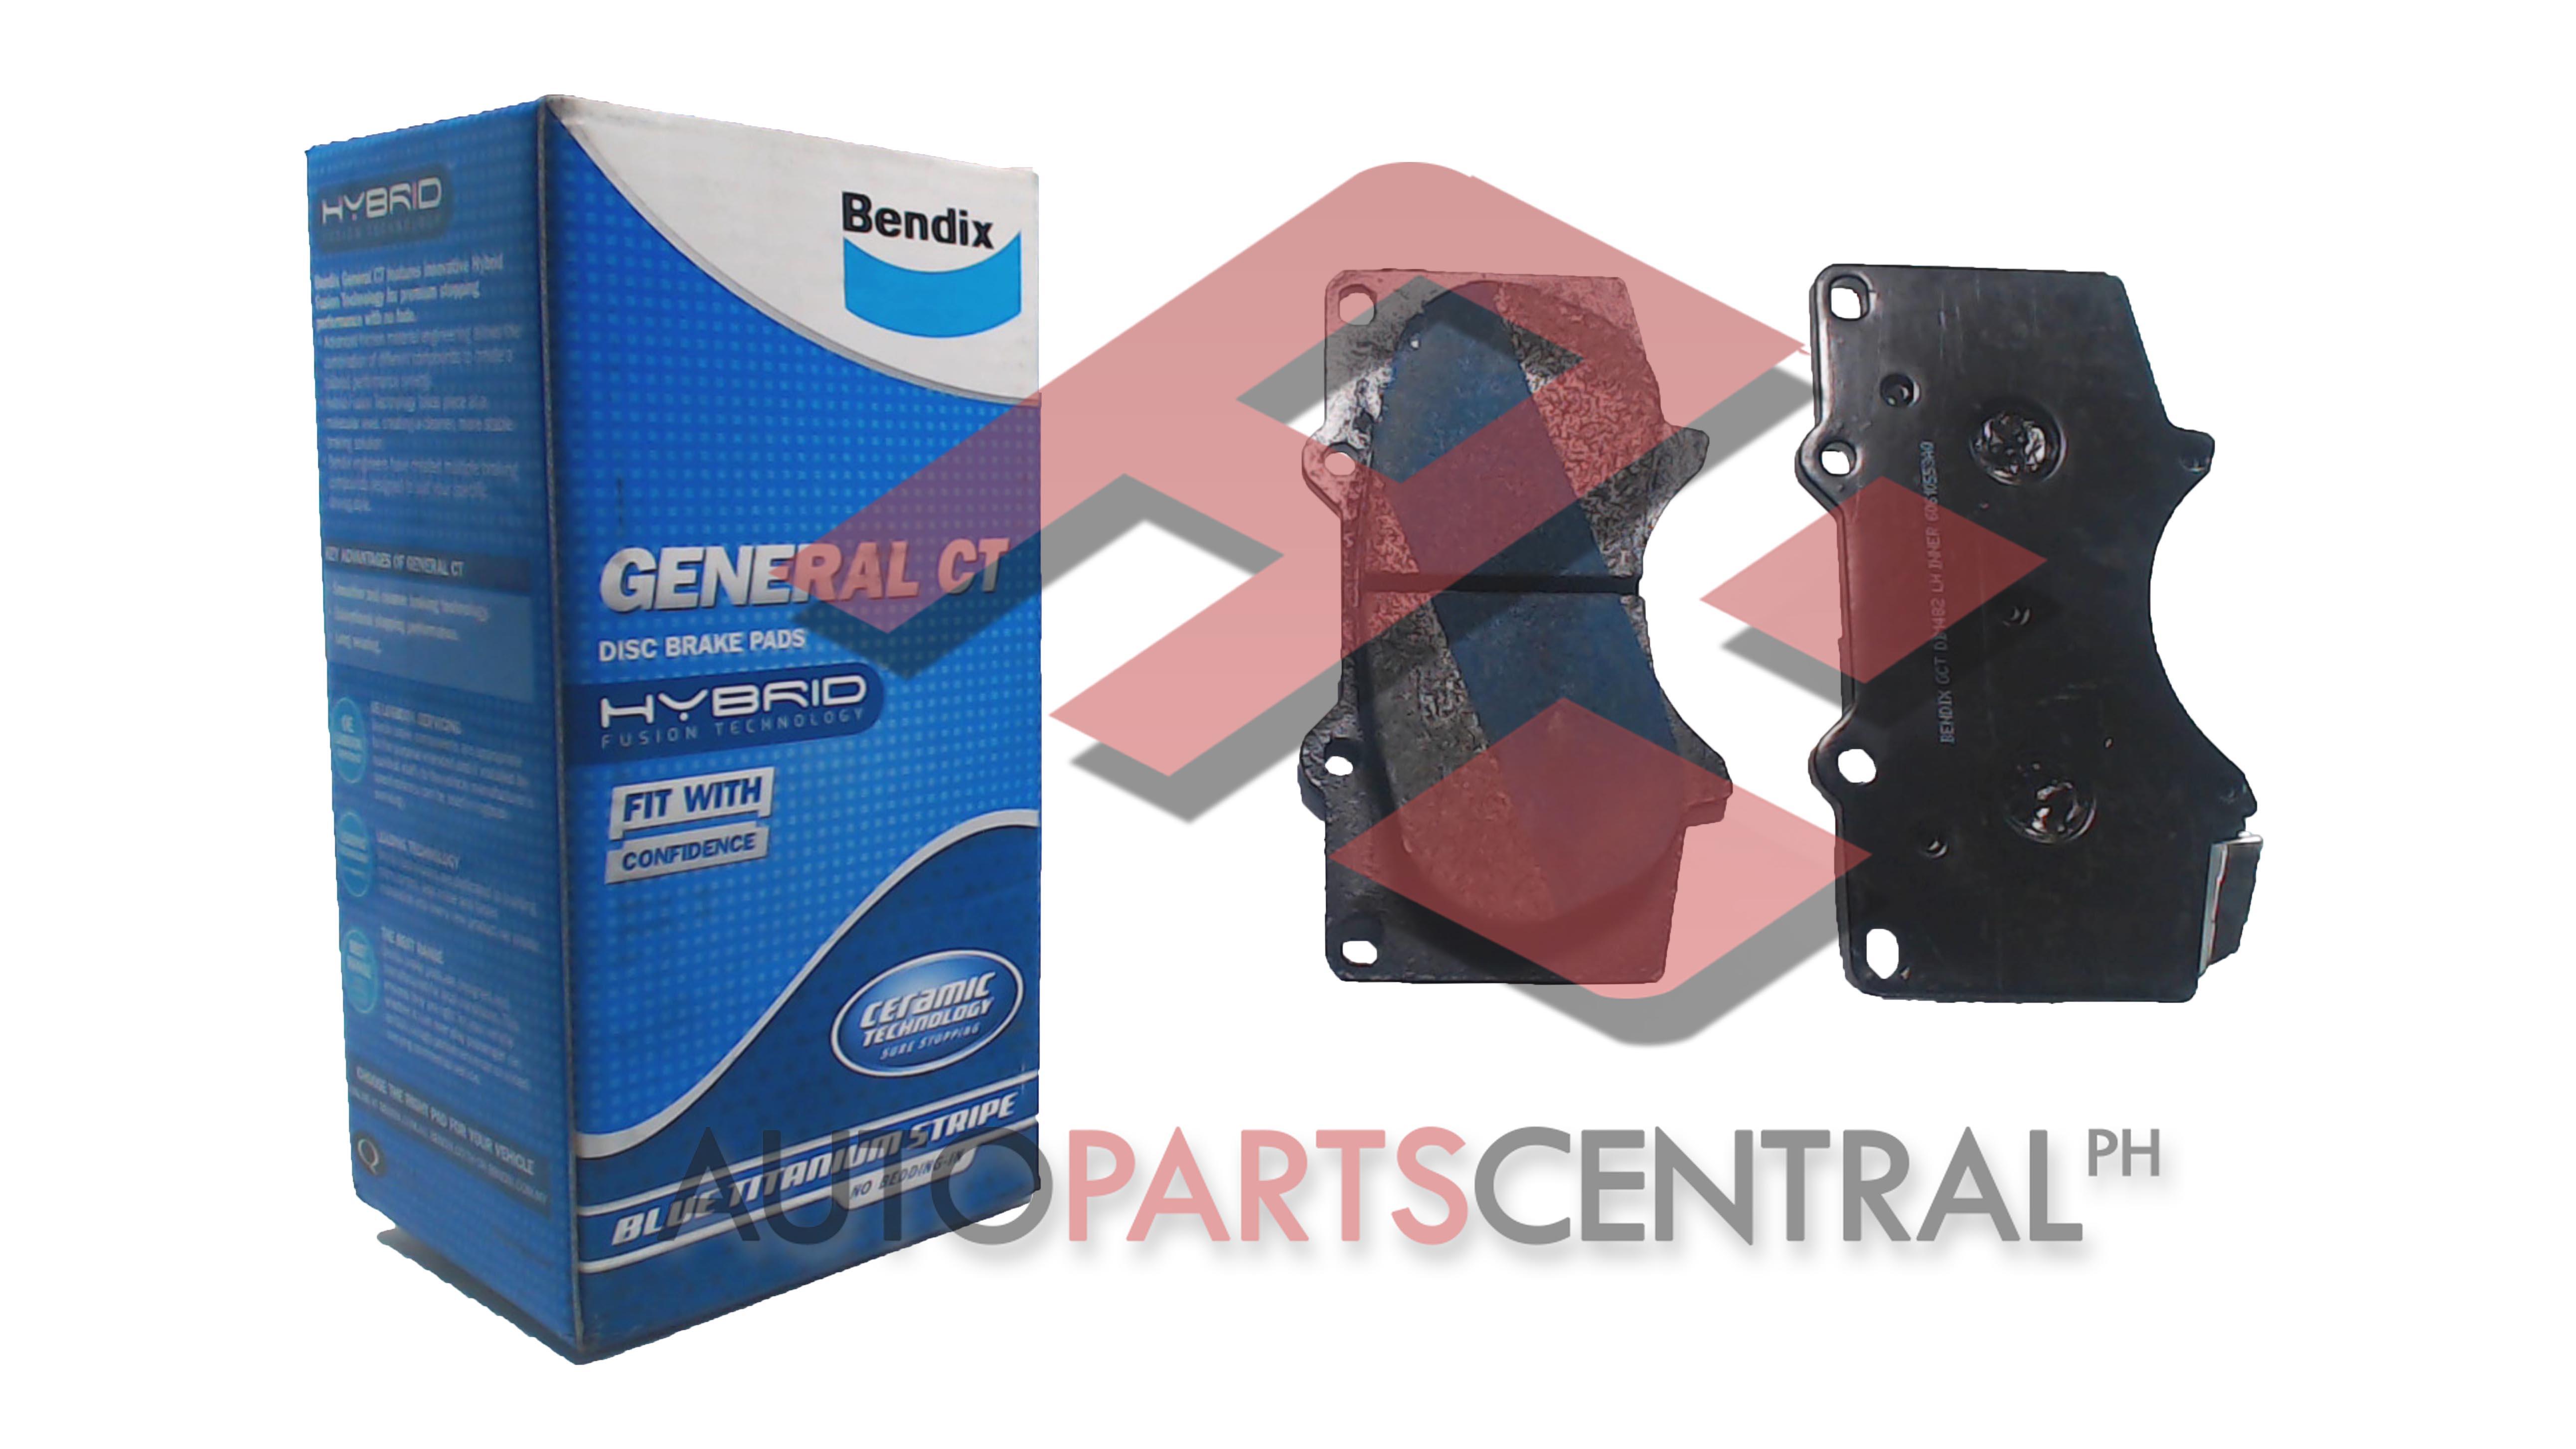 Bendix Db 1482 Gct Brake Pads Autopartscentralph Toyota Fortuner Fuse Box Location